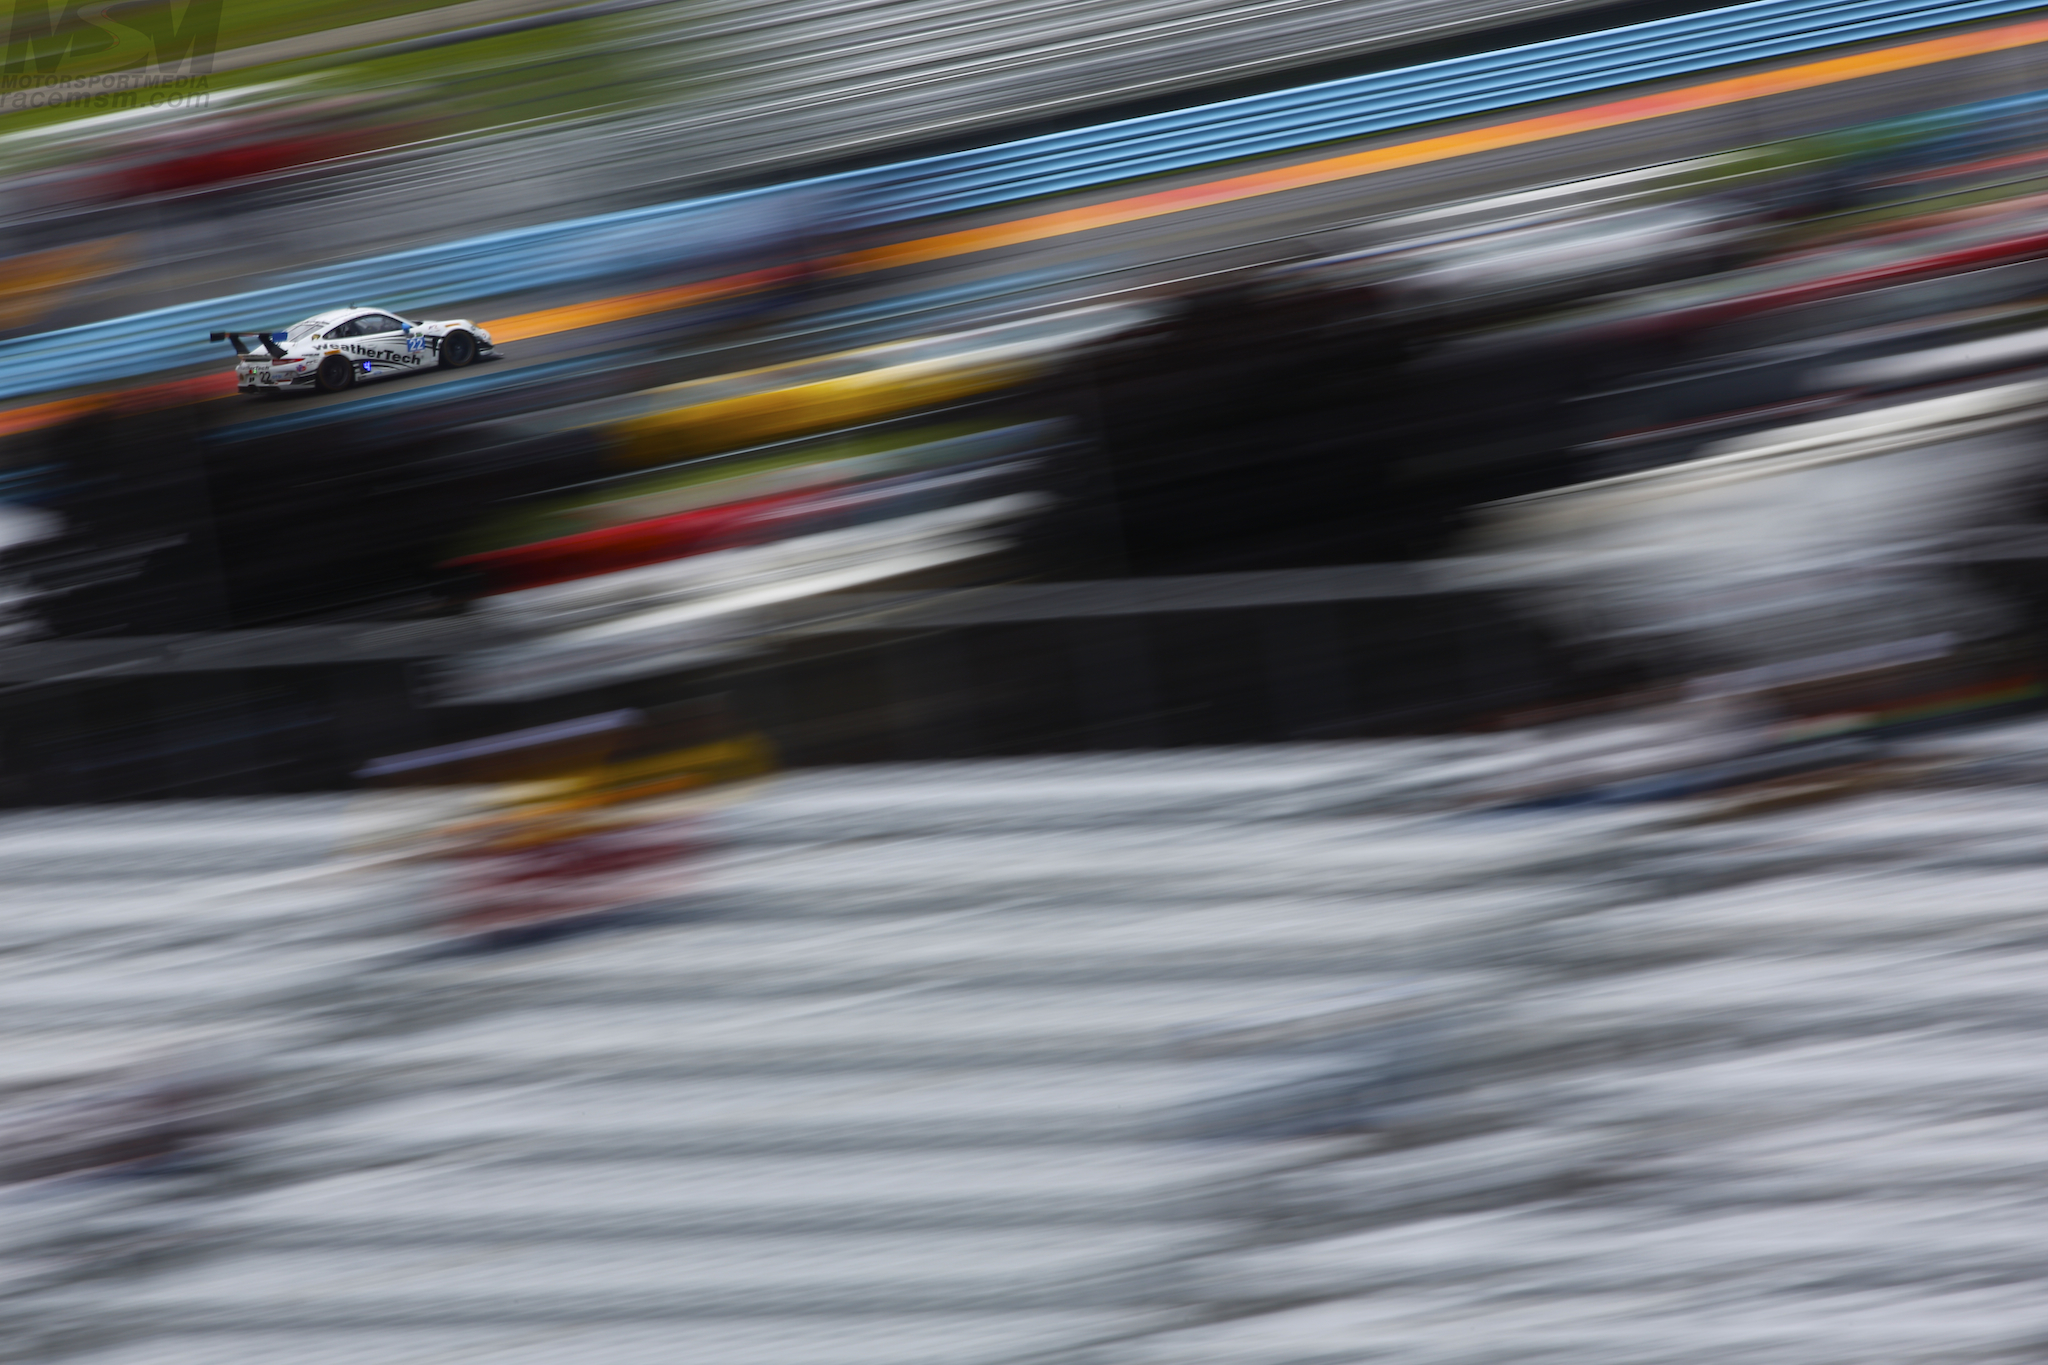 MotorSportMedia Watkins Glen Sunday 2015.jpg